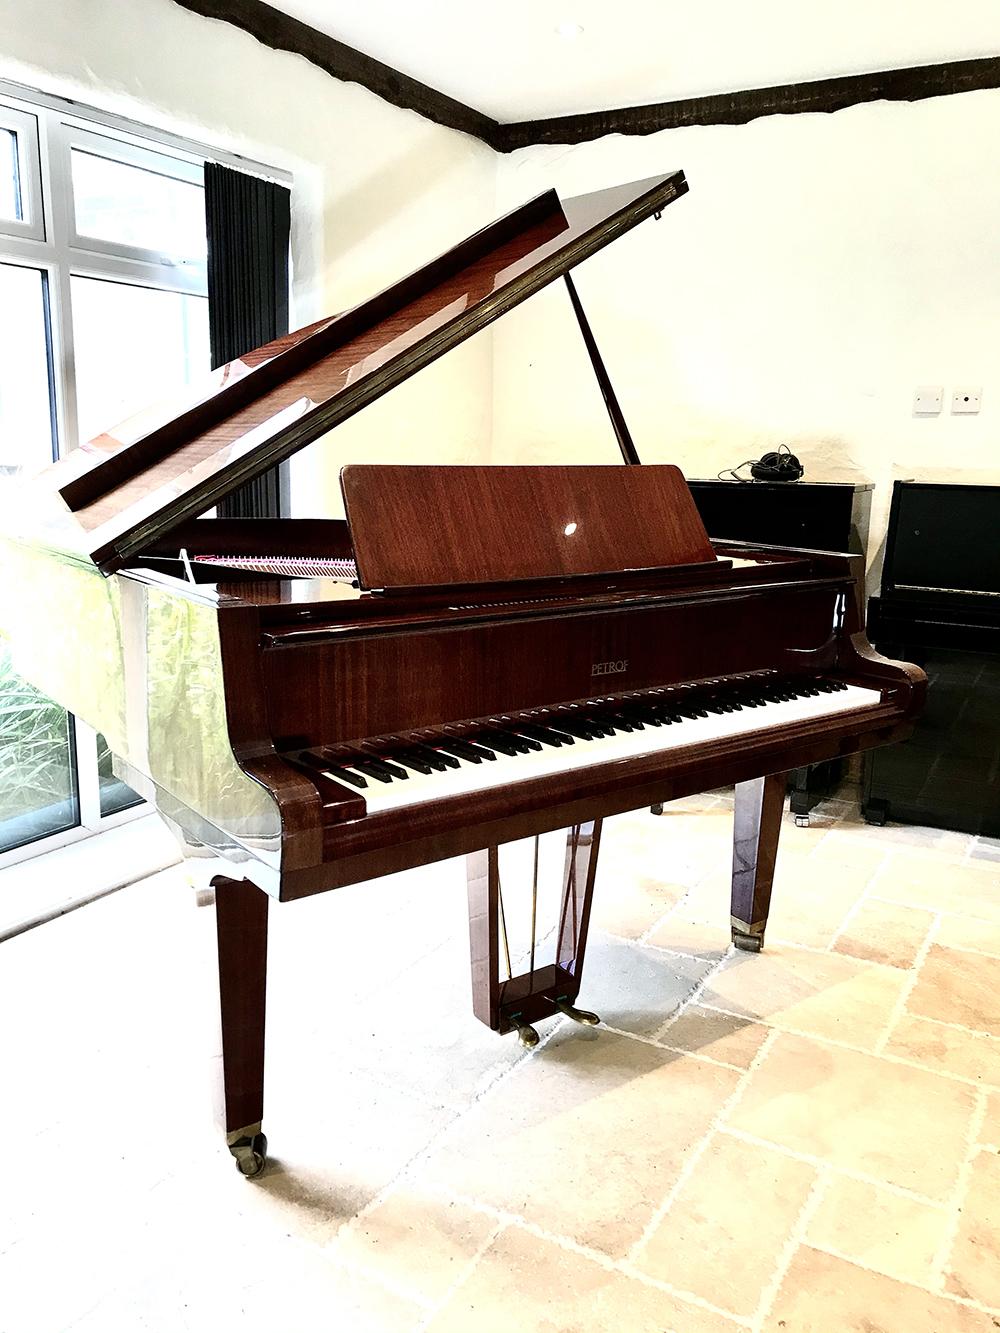 used-petrof-baby-grand-Piano-Dorset-for-sale-7.jpg